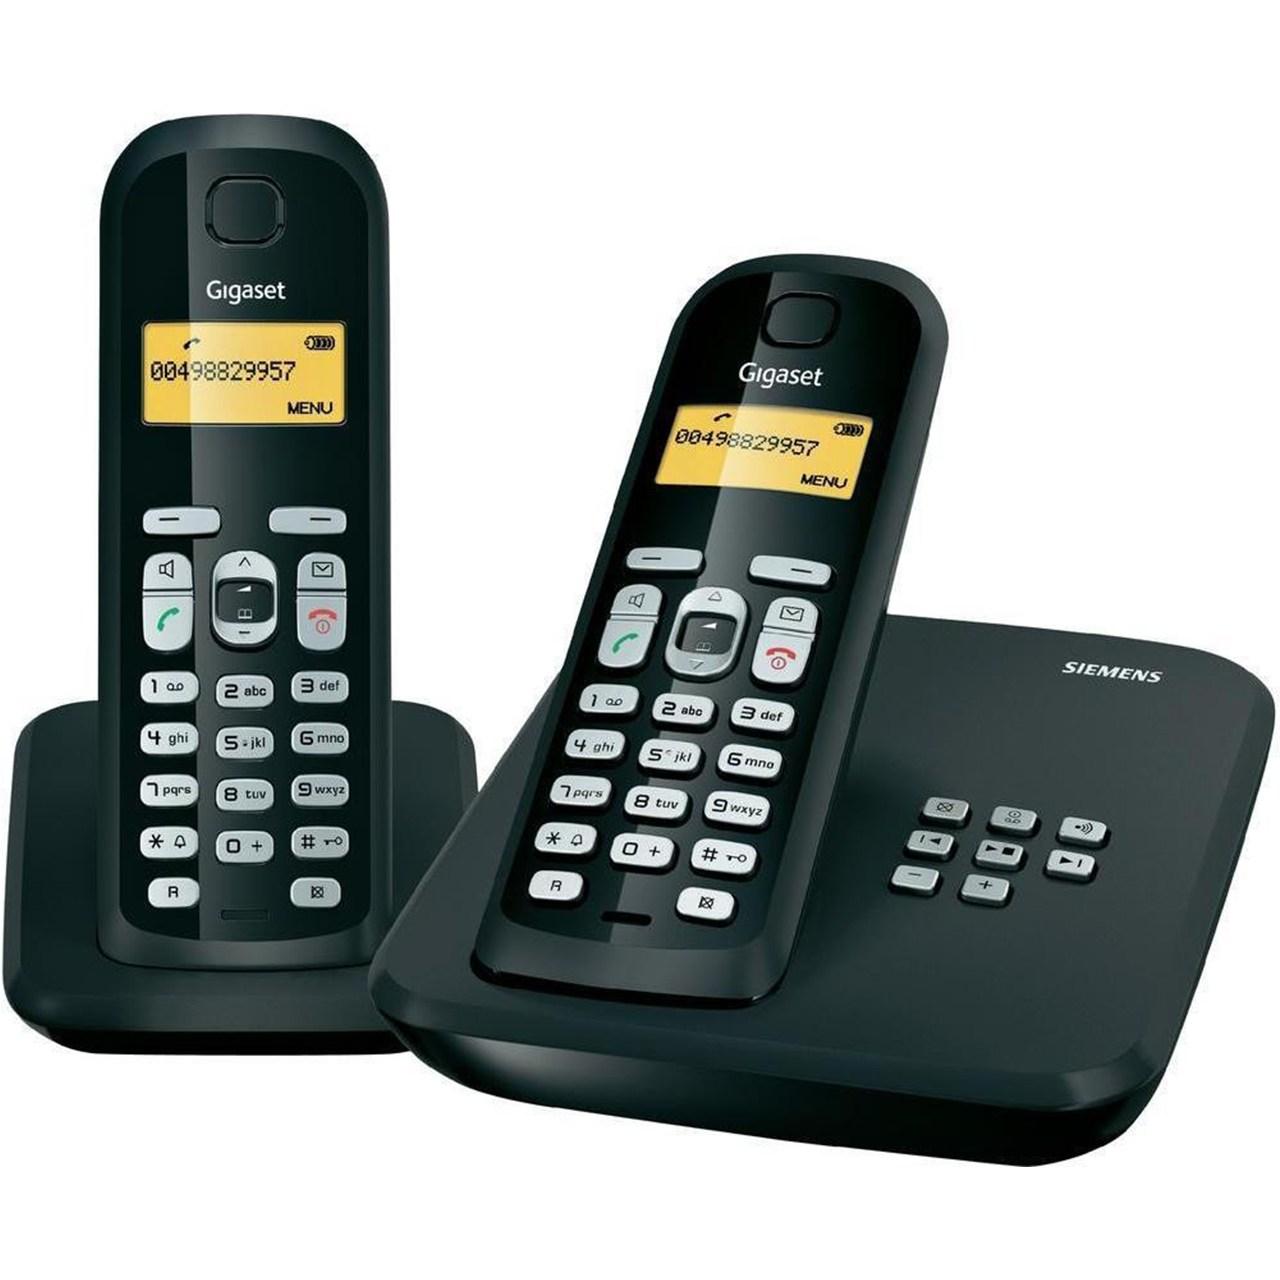 تلفن بی سیم گیگاست AS300 A Duo